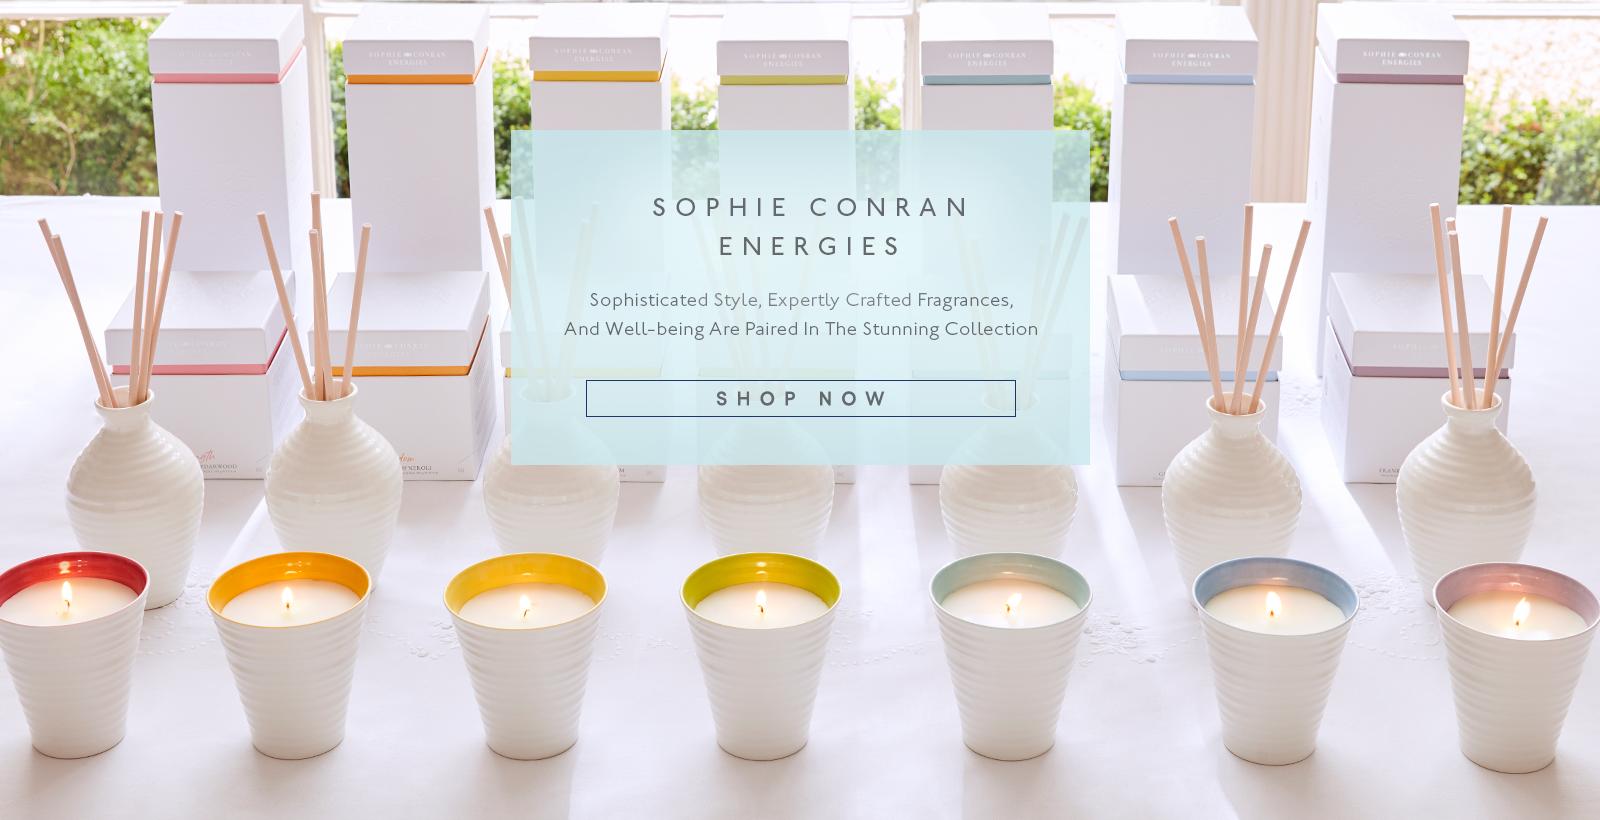 Sophie Conran Energies